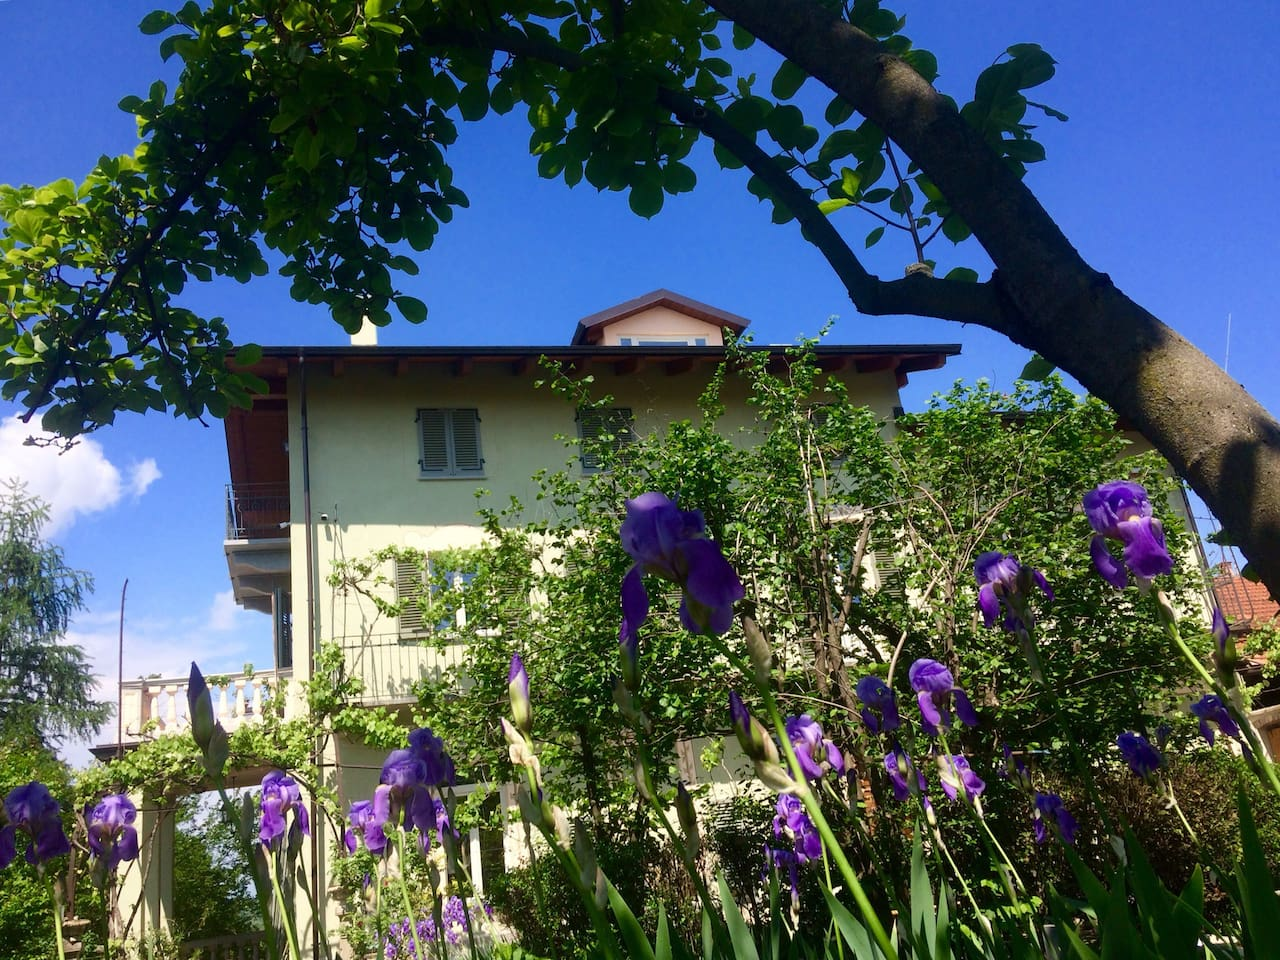 Giugno : casa vista dal giardino.